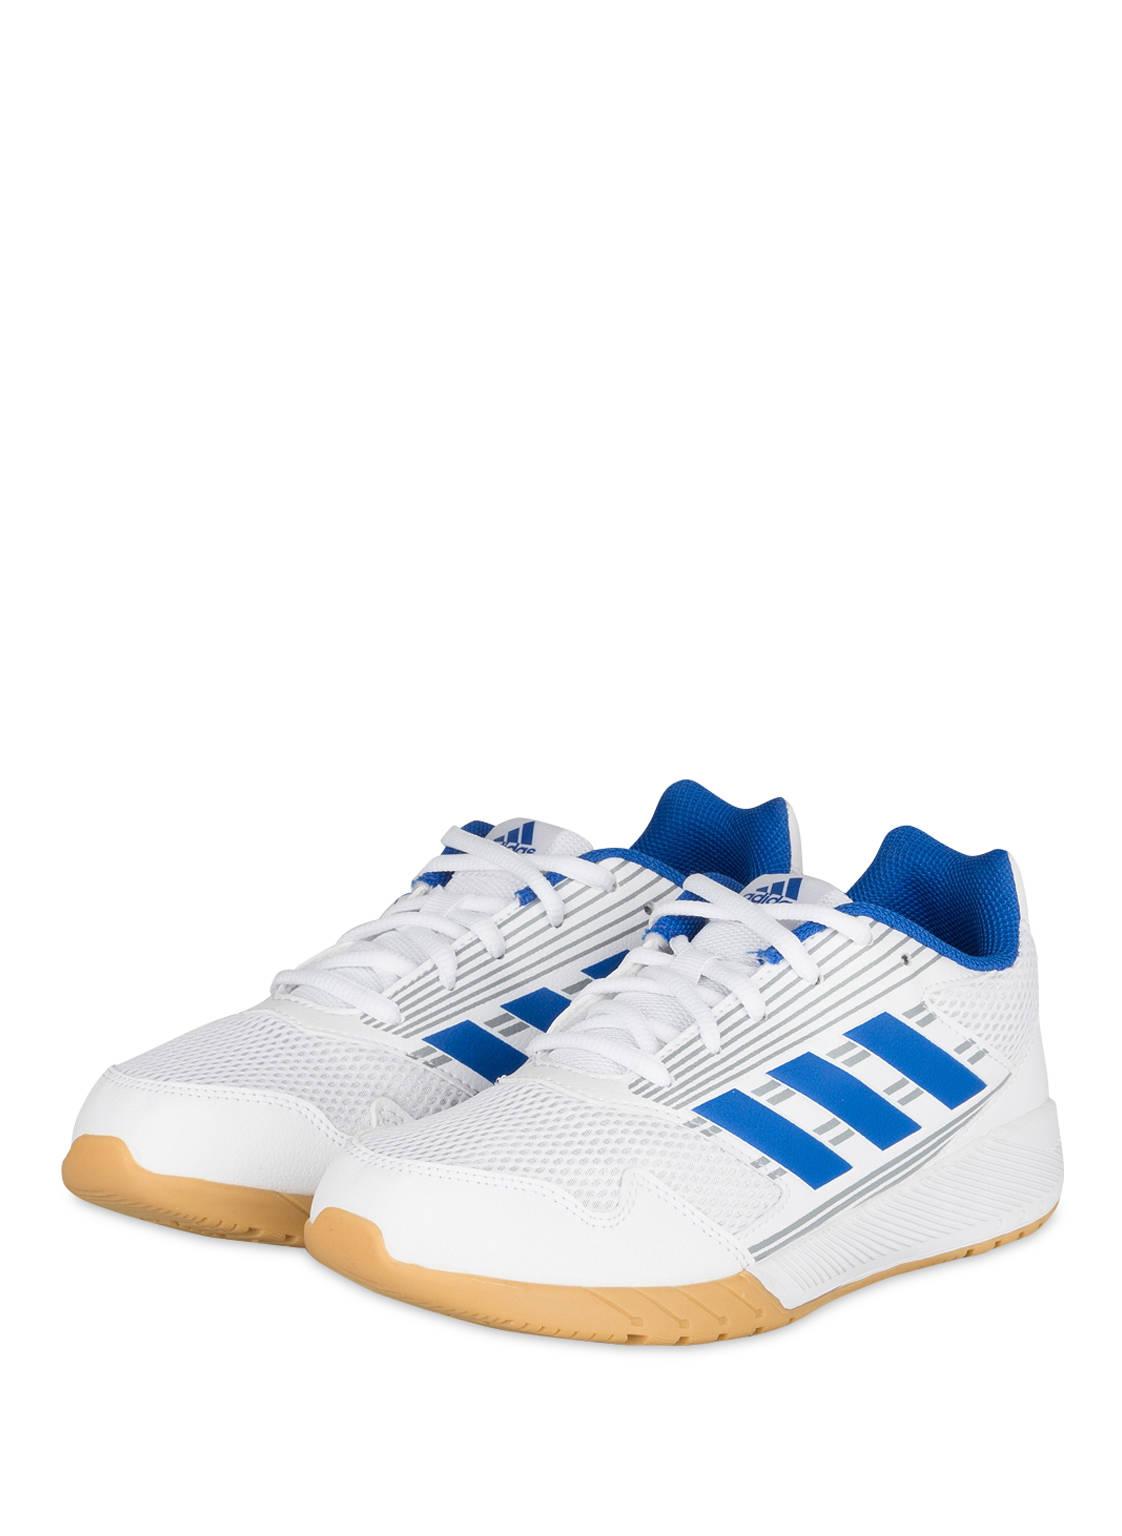 adidas RapidaRun Laufschuhe Kinder - Gedämpfte Laufschuhe ASH BLUE S18/TRACE R 4 80TNcUI